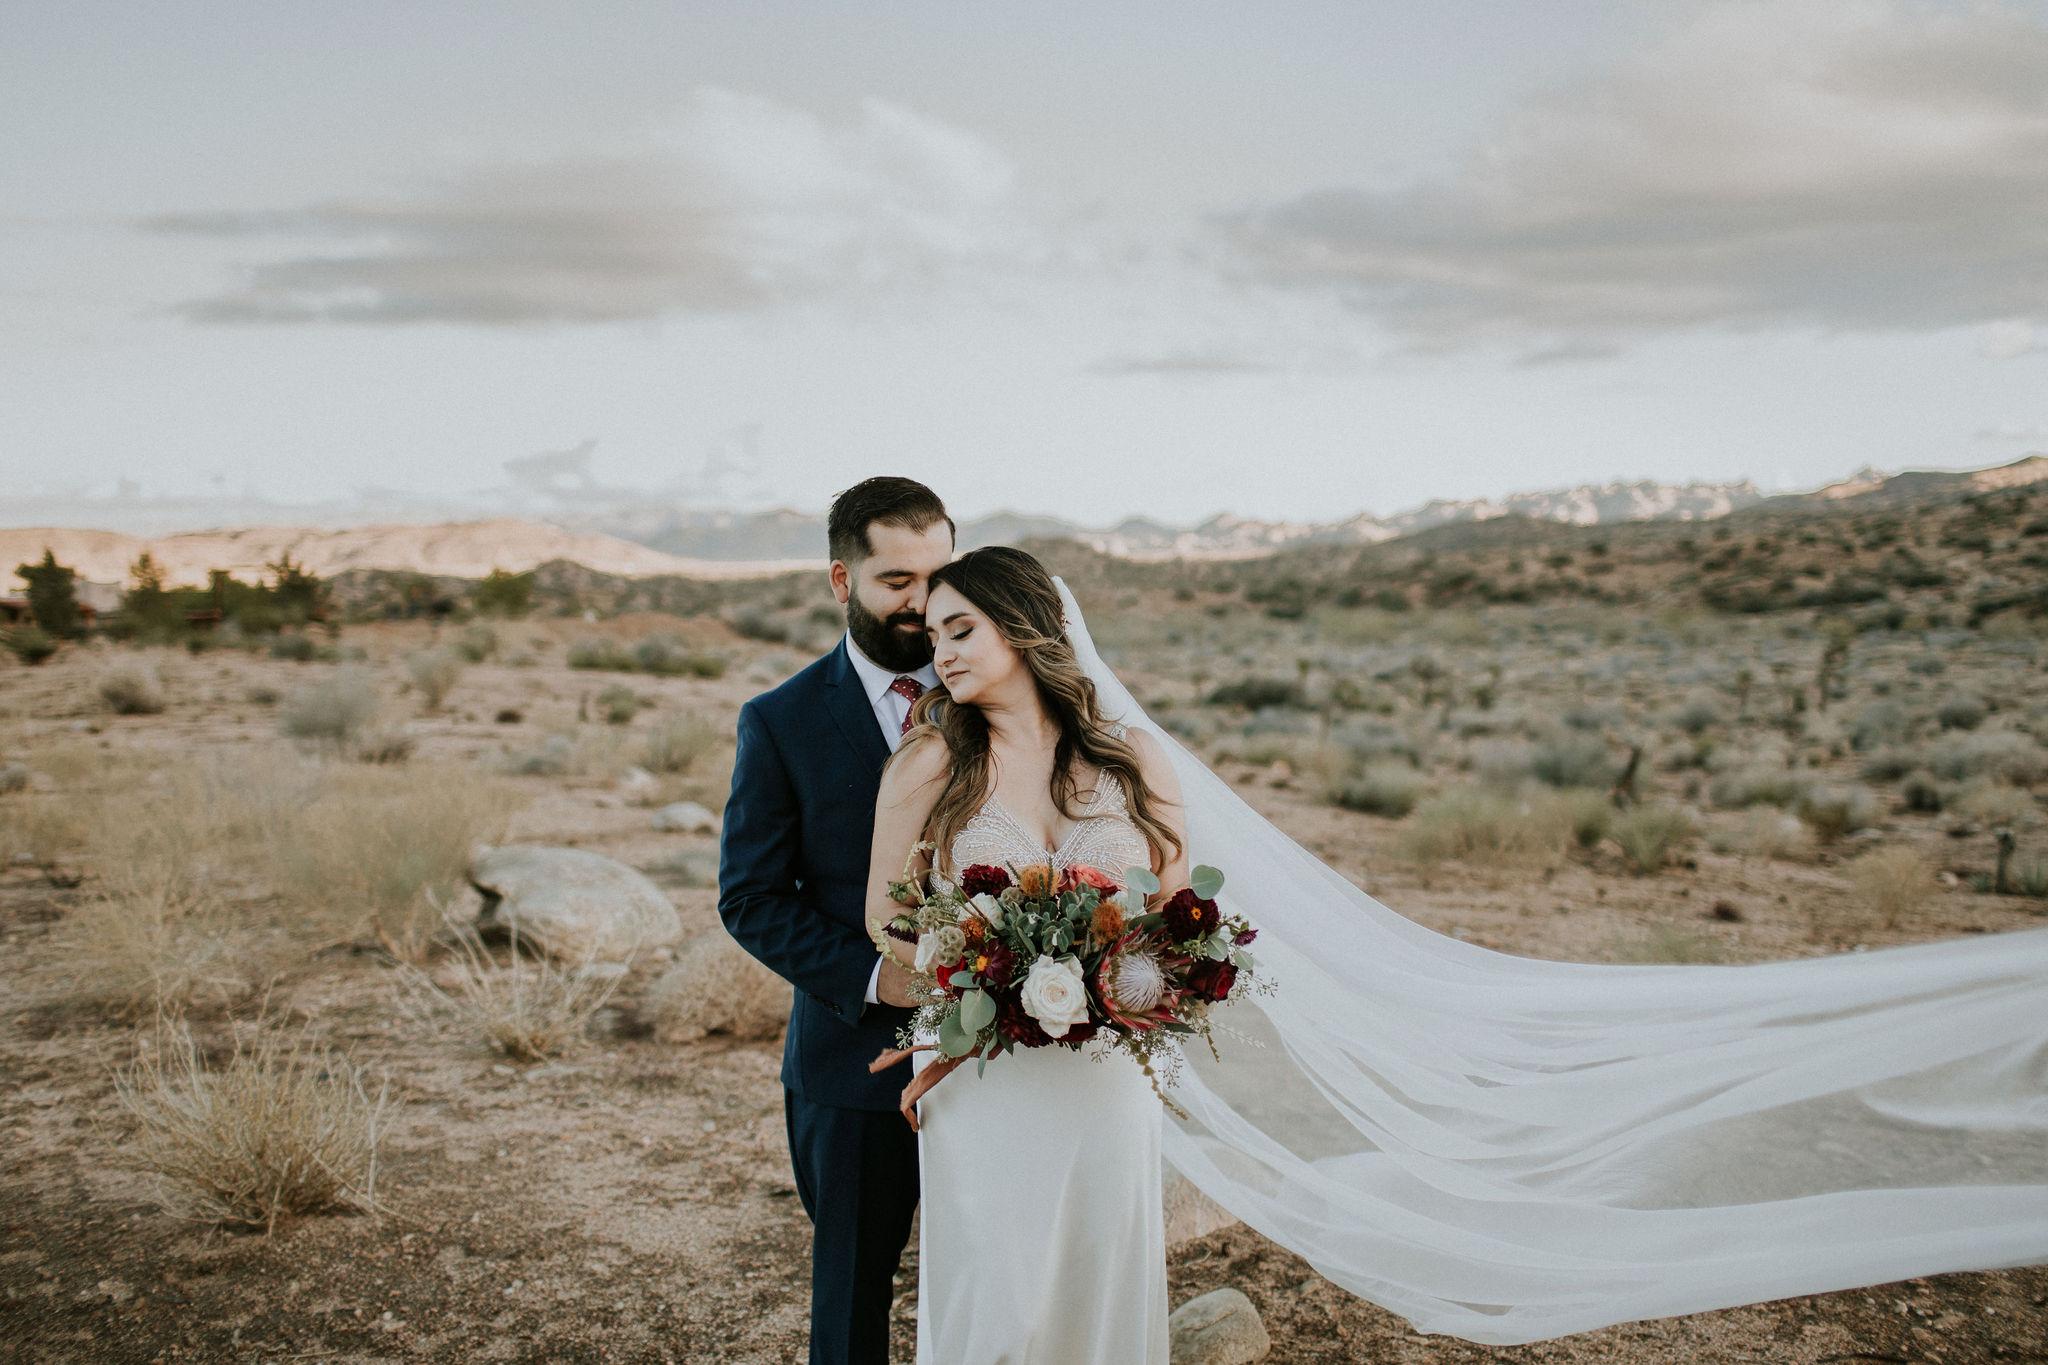 RimrockRanch-JoshuaTree-Wedding-Jami-Laree-660.jpg